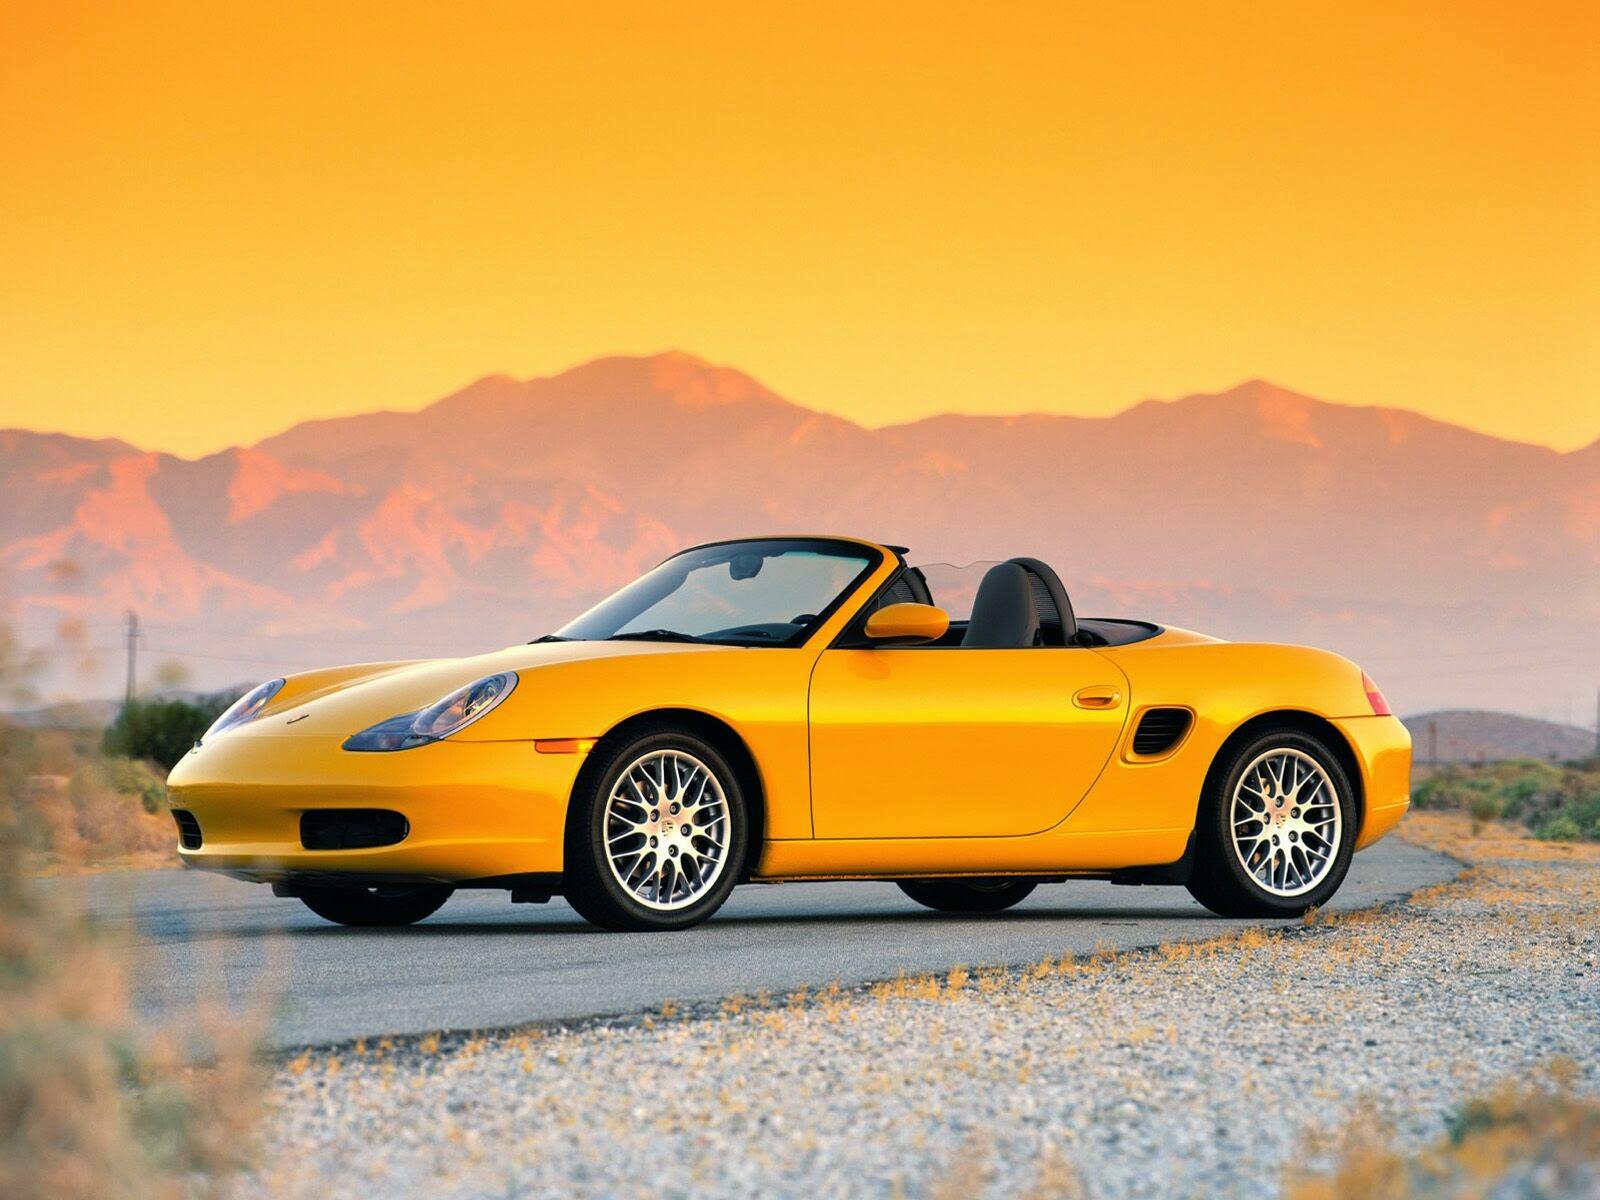 Wallpaper Mobil Sport Modifikasi Hd: Sport Car Wallpaper Hd Mobile Free Download